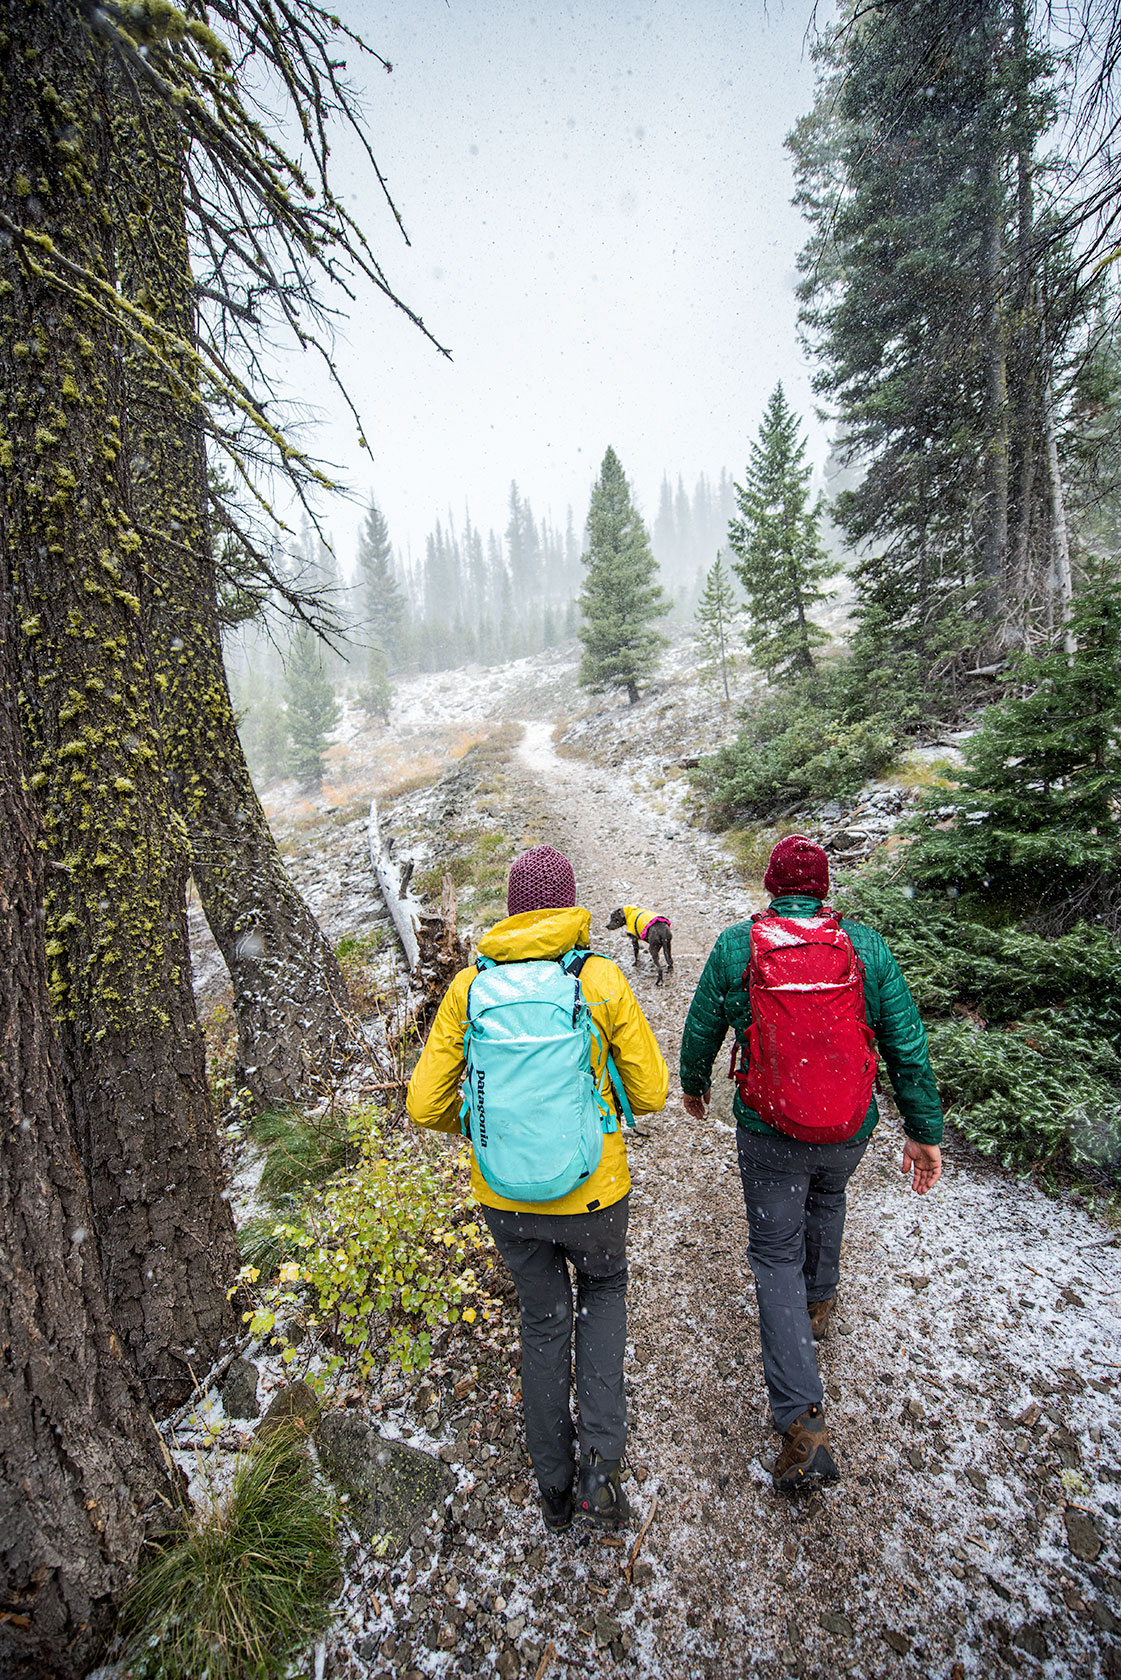 austin-trigg-patagonia-sawtooth-hiking-advenure-wilderness-forest-idaho-outside-lifestyle-day-fall-weather-mountains-stanley-lake-snow.jpg